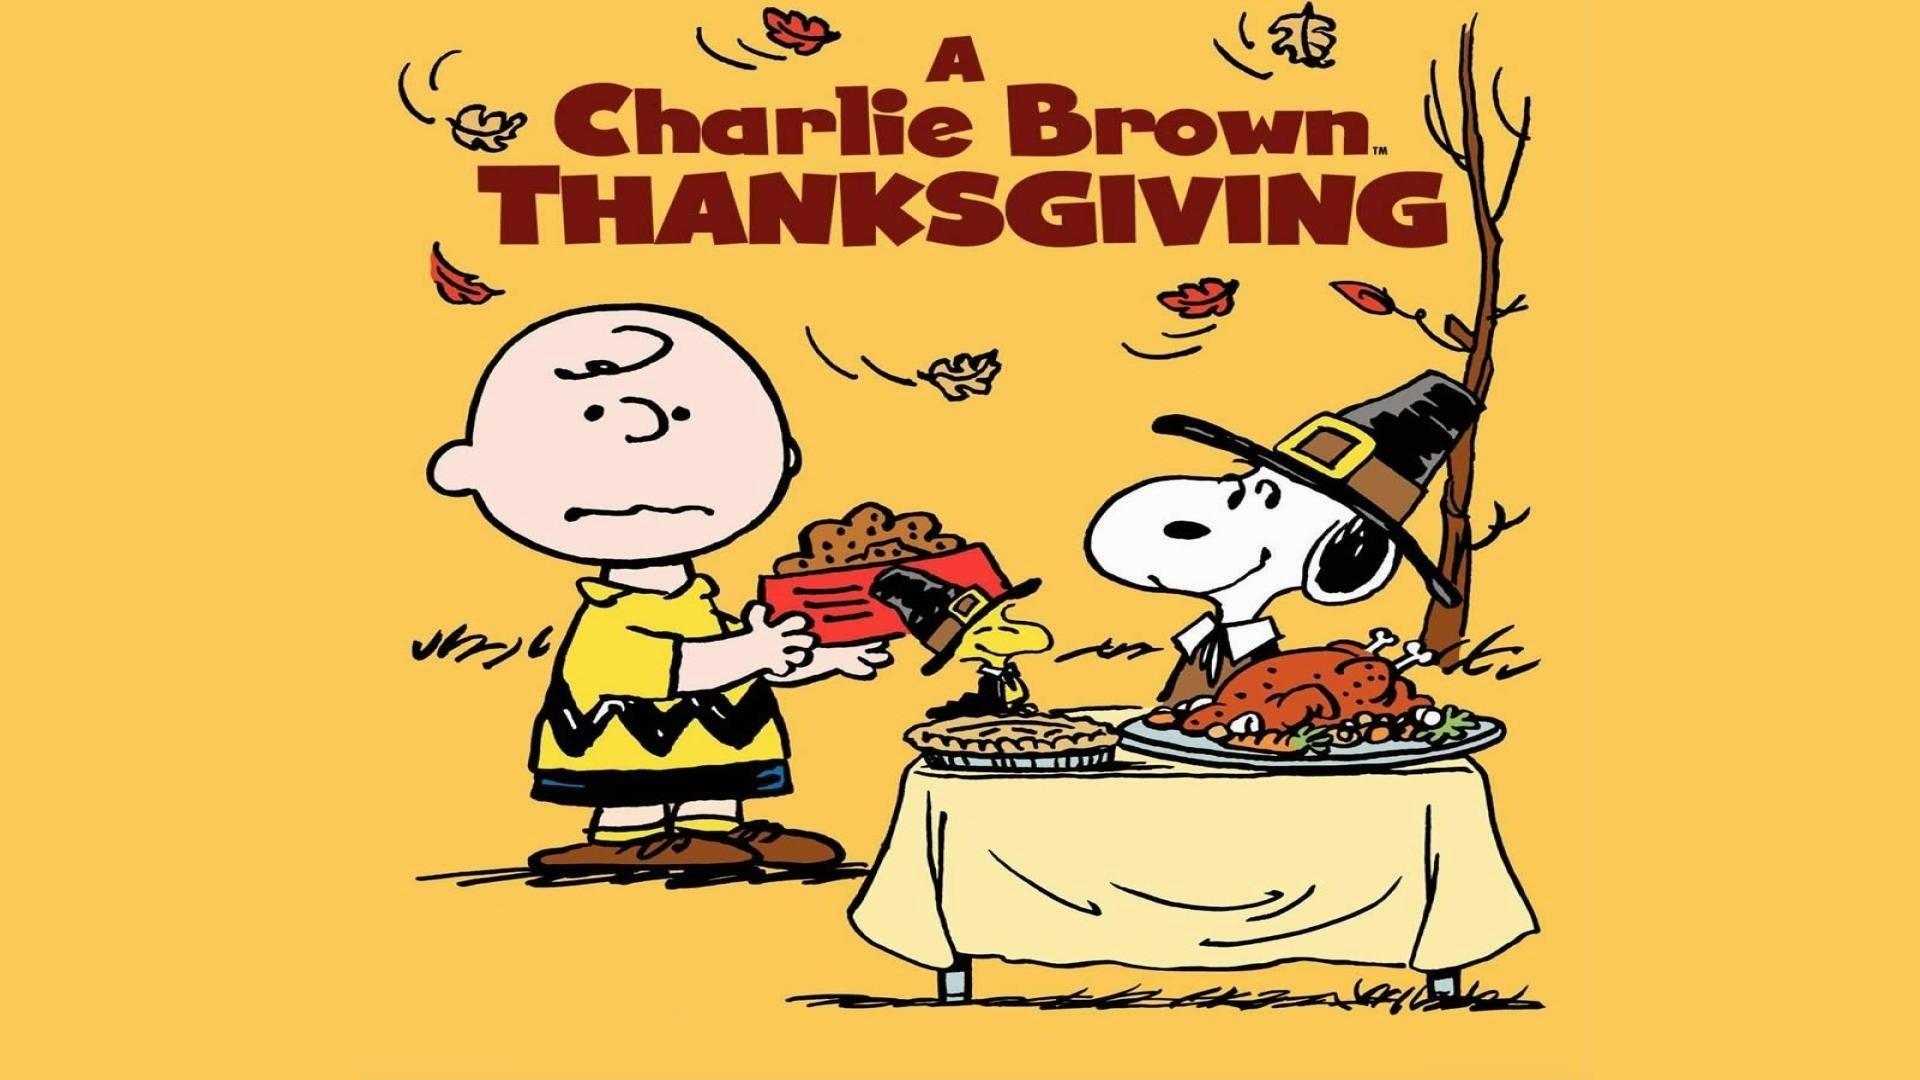 funny-thanksgiving-desktop-wallpaper-wp2005775